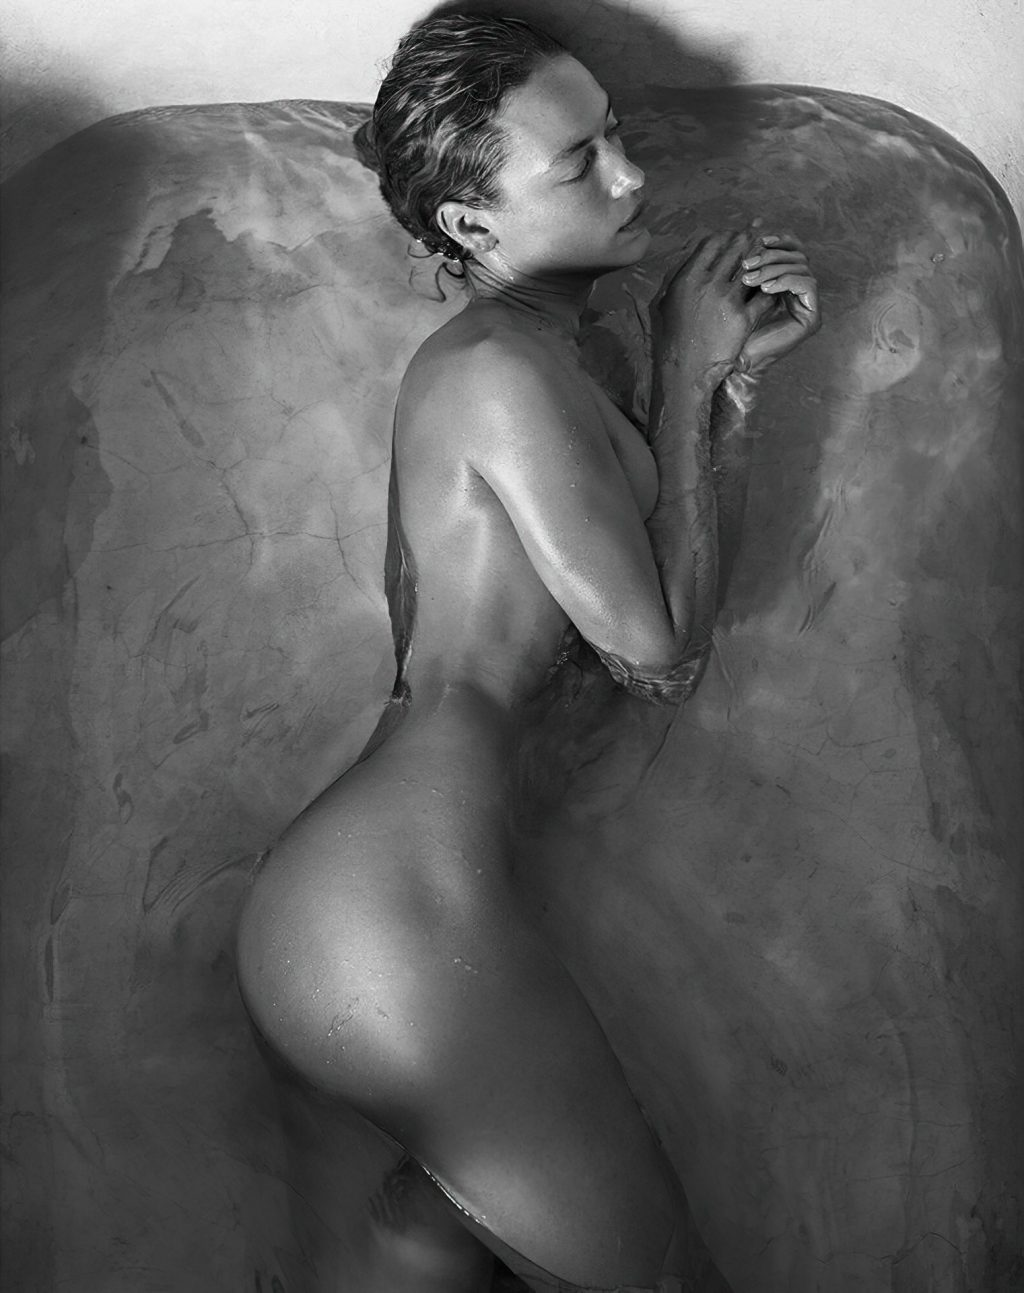 Hannah Ferguson Hot – Vogue (2 Photos)